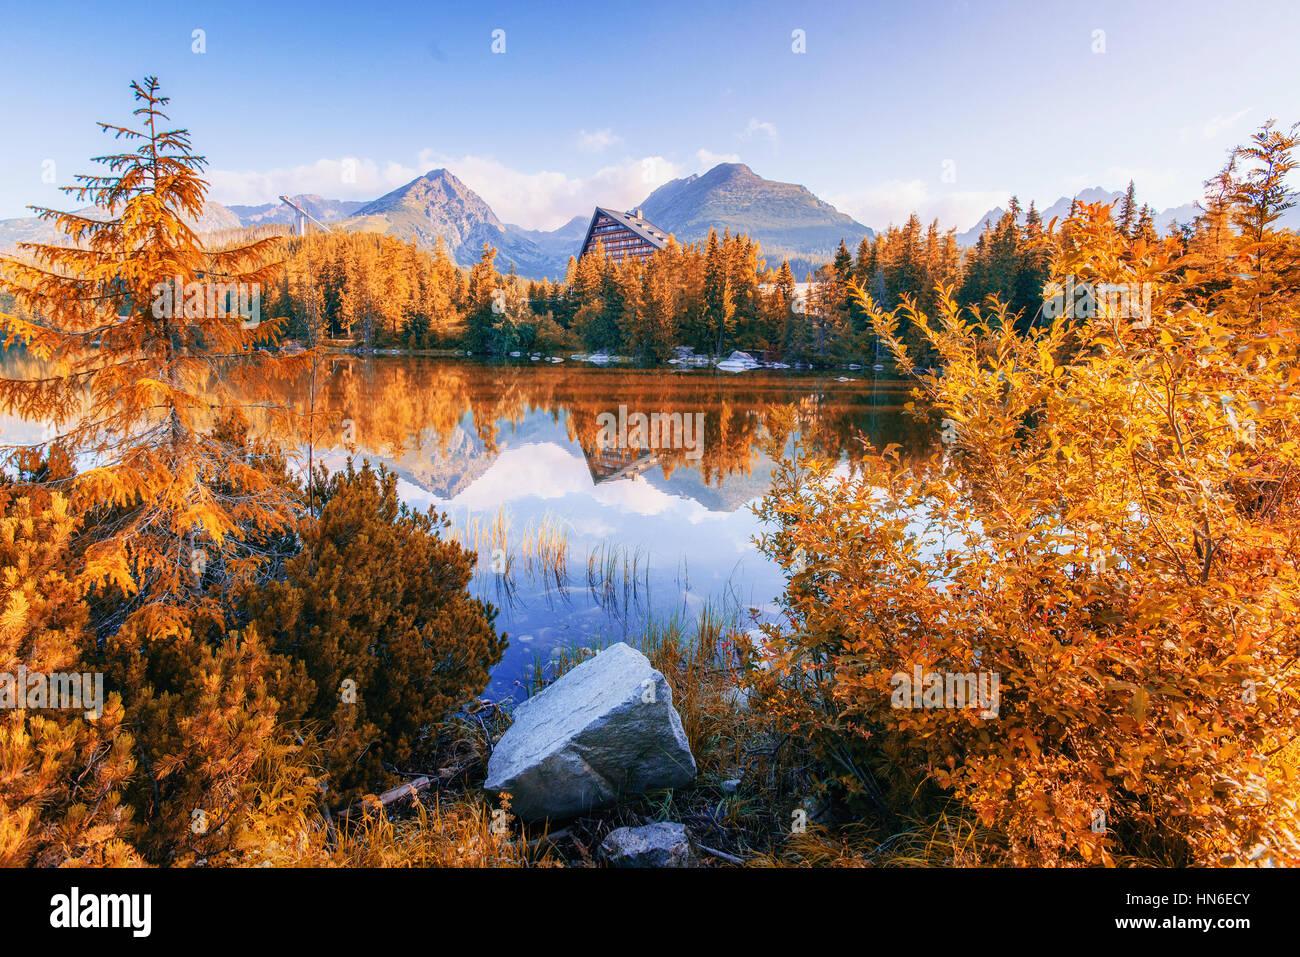 Majestätische Bergsee im Nationalpark Hohe Tatra. Strbske Pleso, Slowakei, Europa. Stockbild